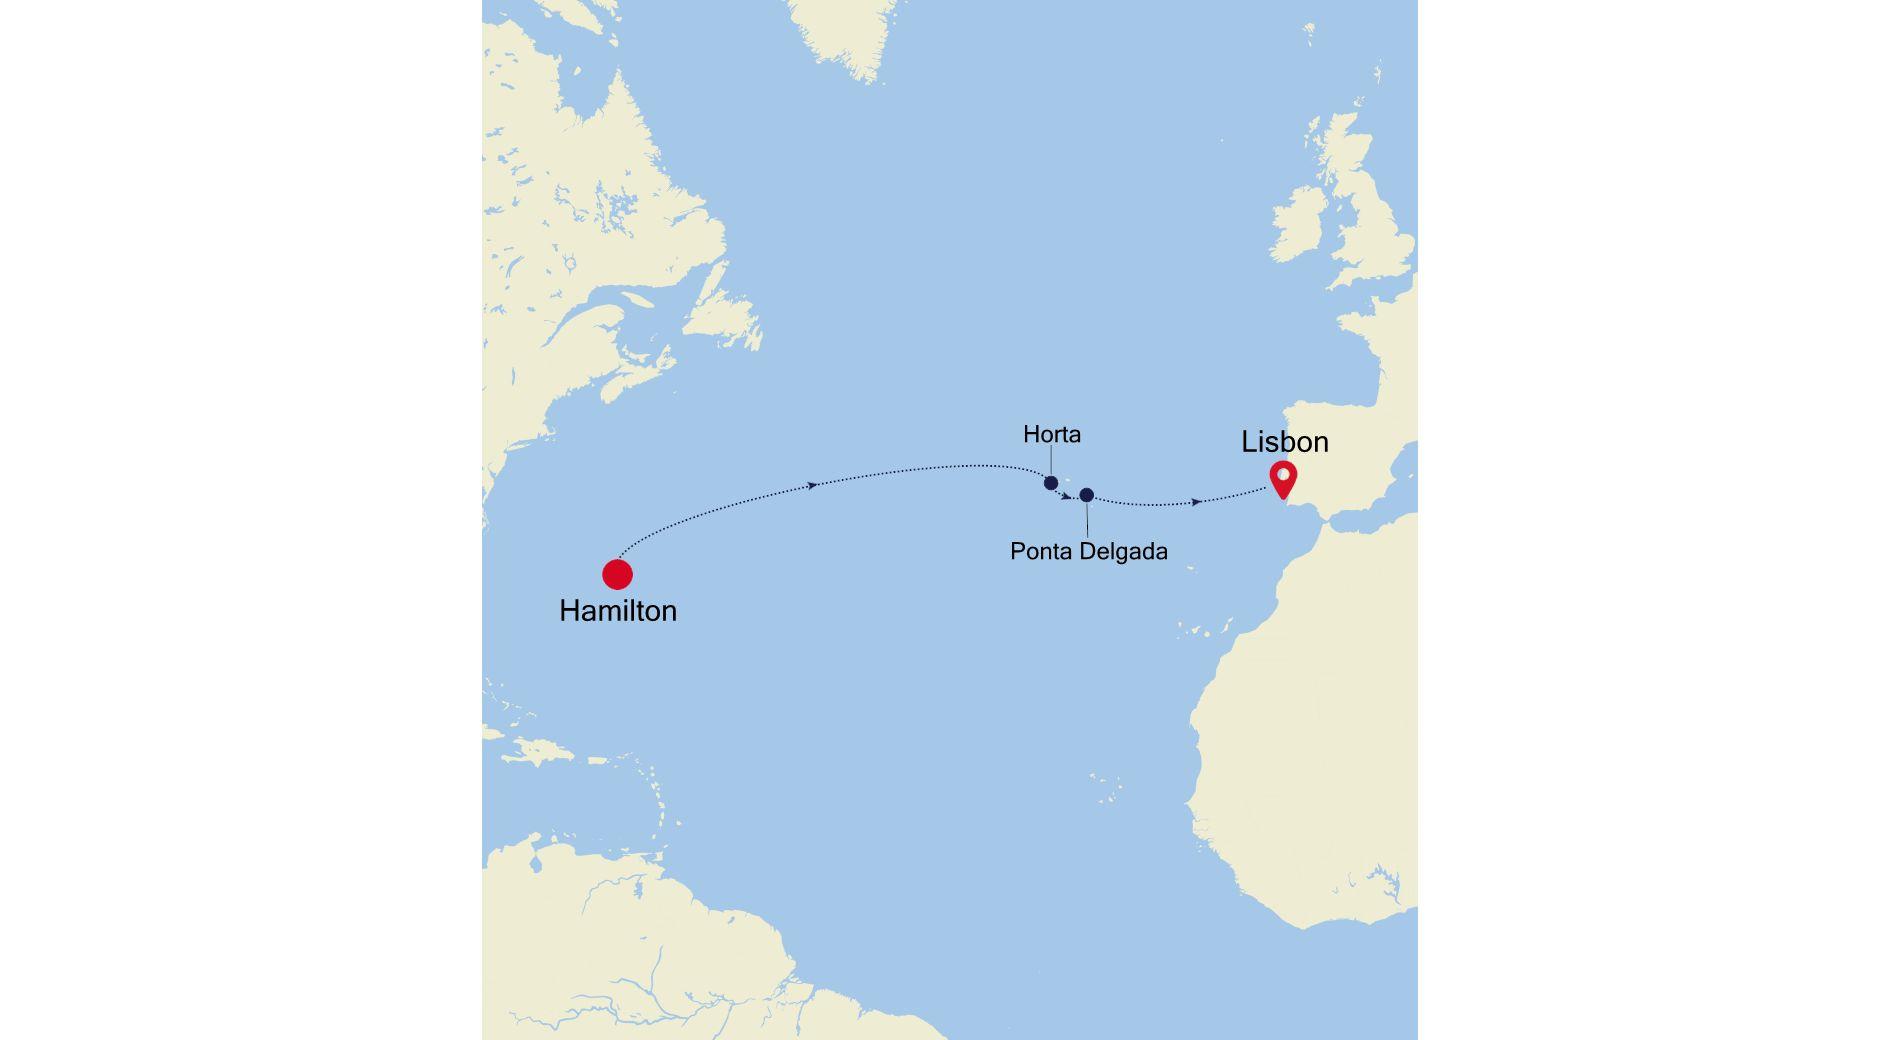 SS210418S10 - Hamilton to Lisbon